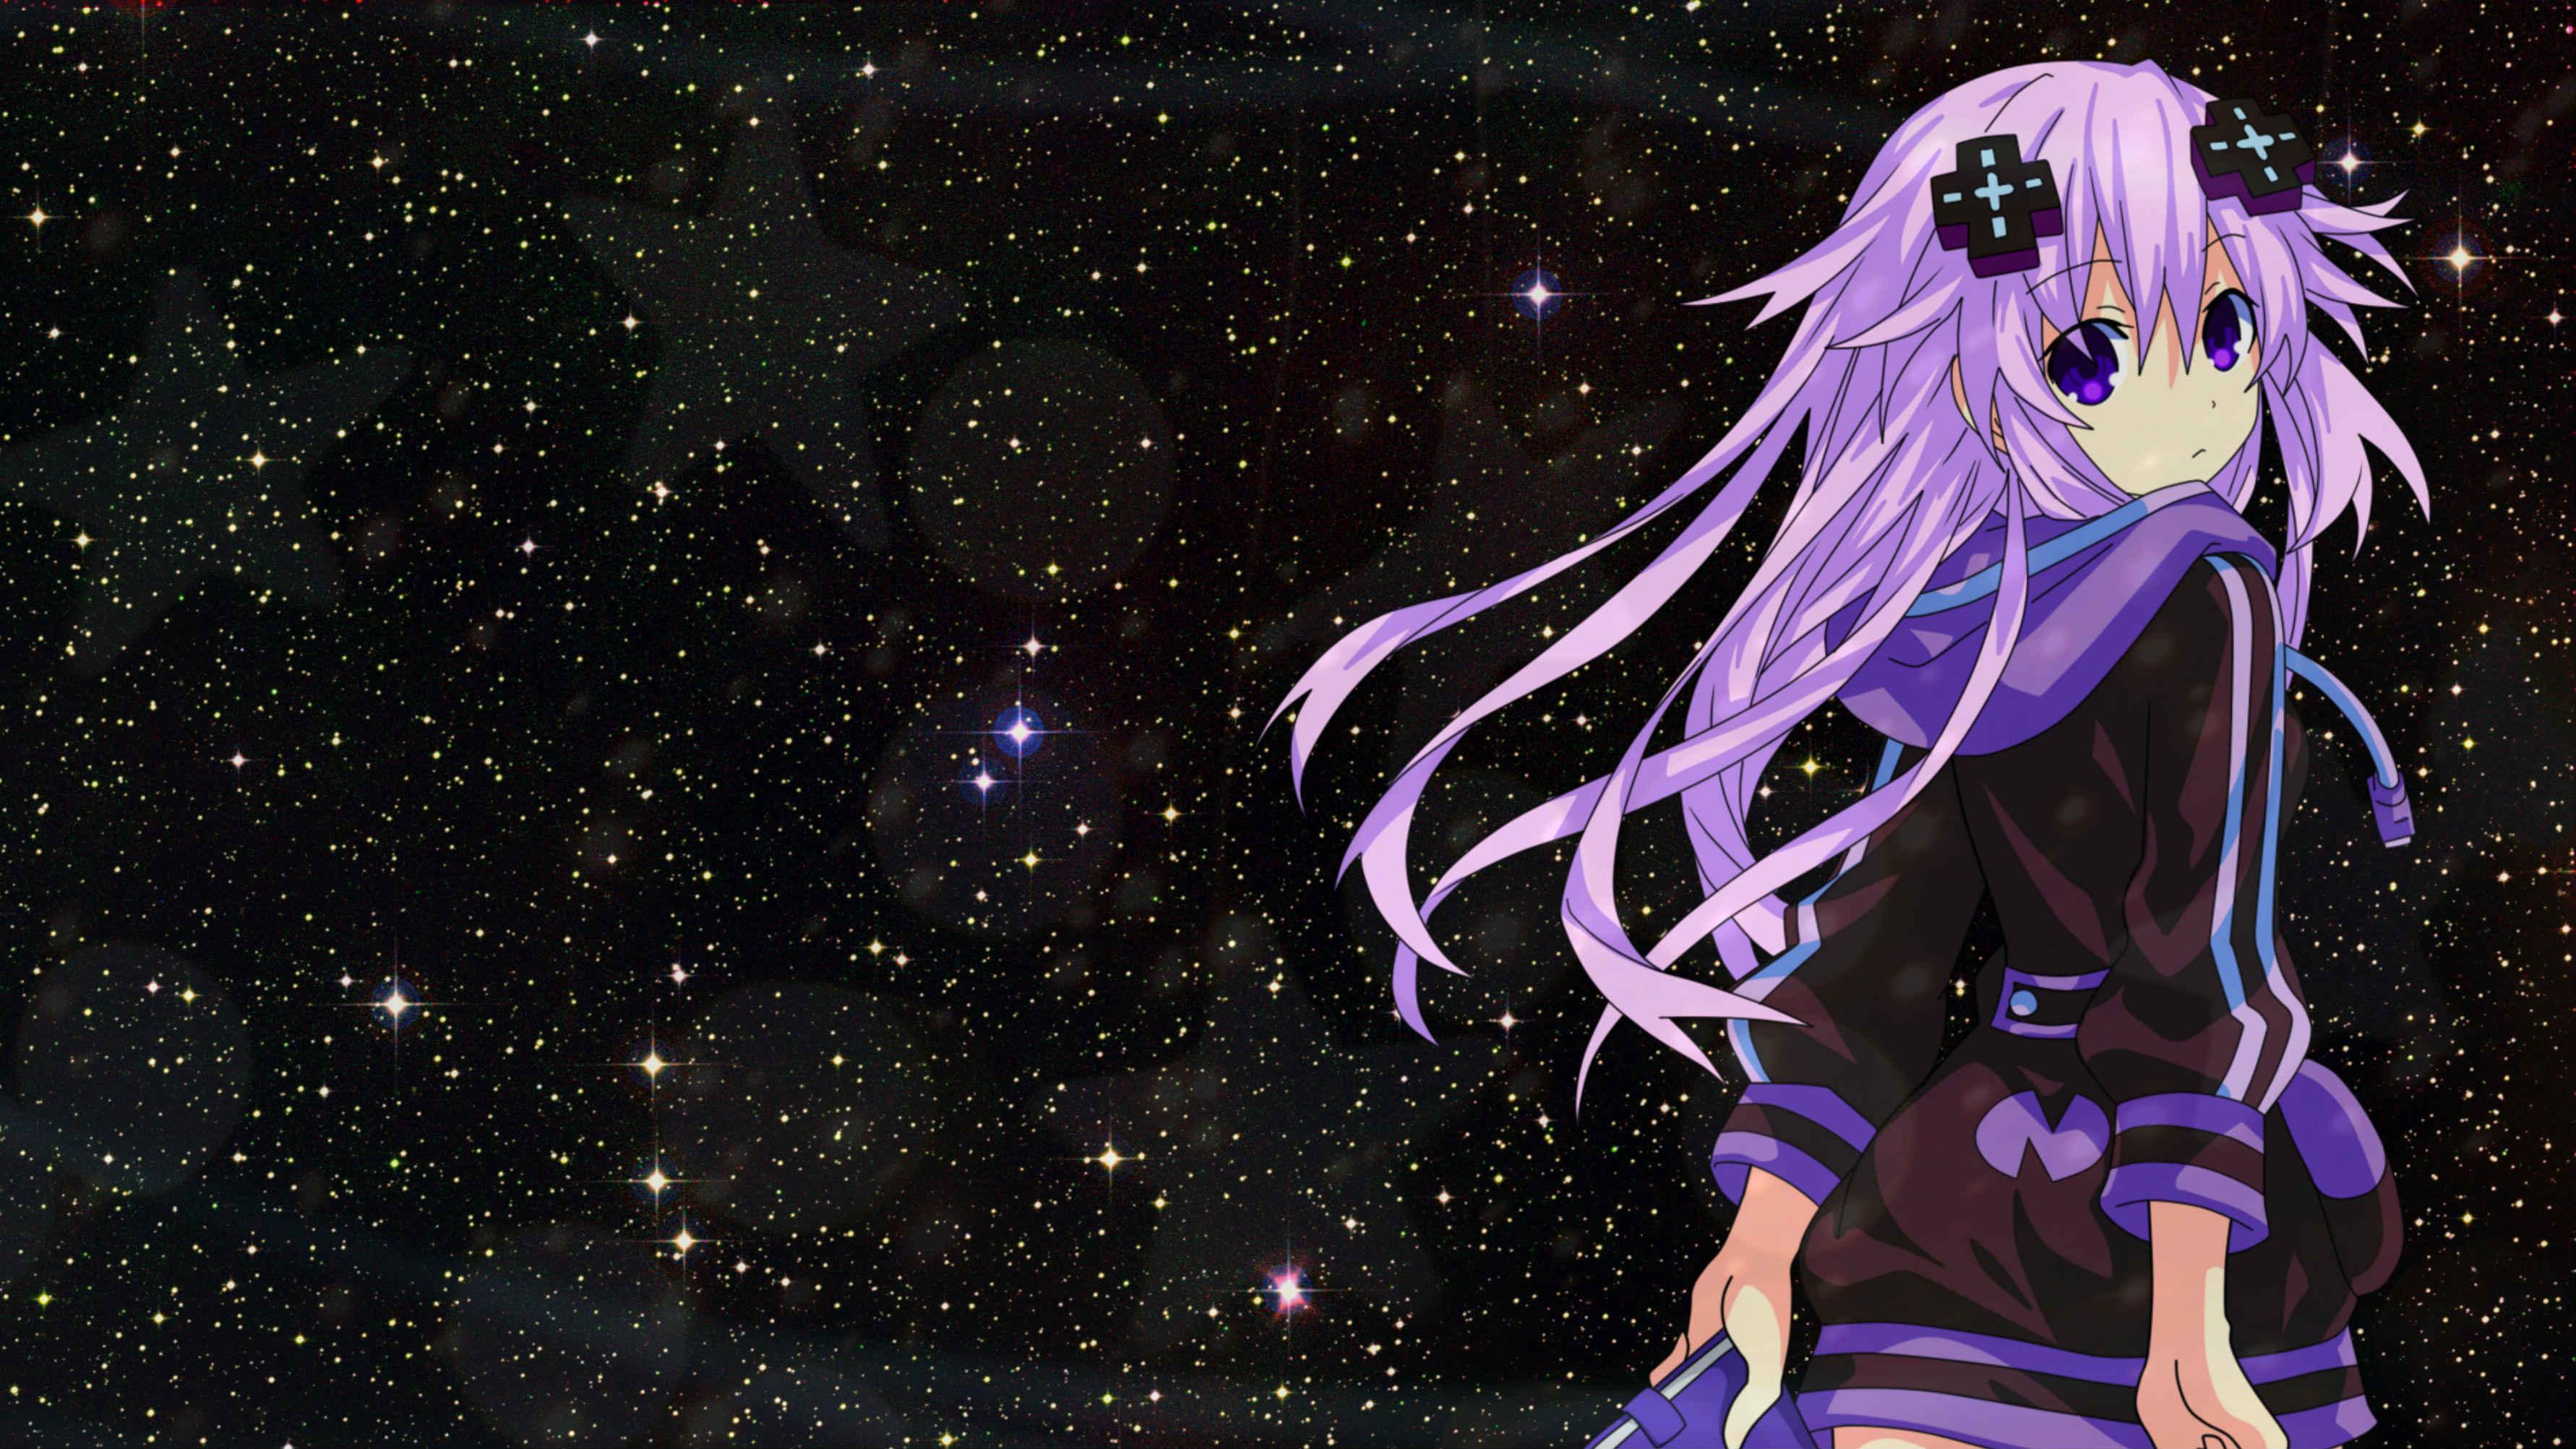 Hyperdimension Neptunia Hd Wallpaper Hyperdimension Neptunia Neptune Background 1460165 Hd Wallpaper Backgrounds Download